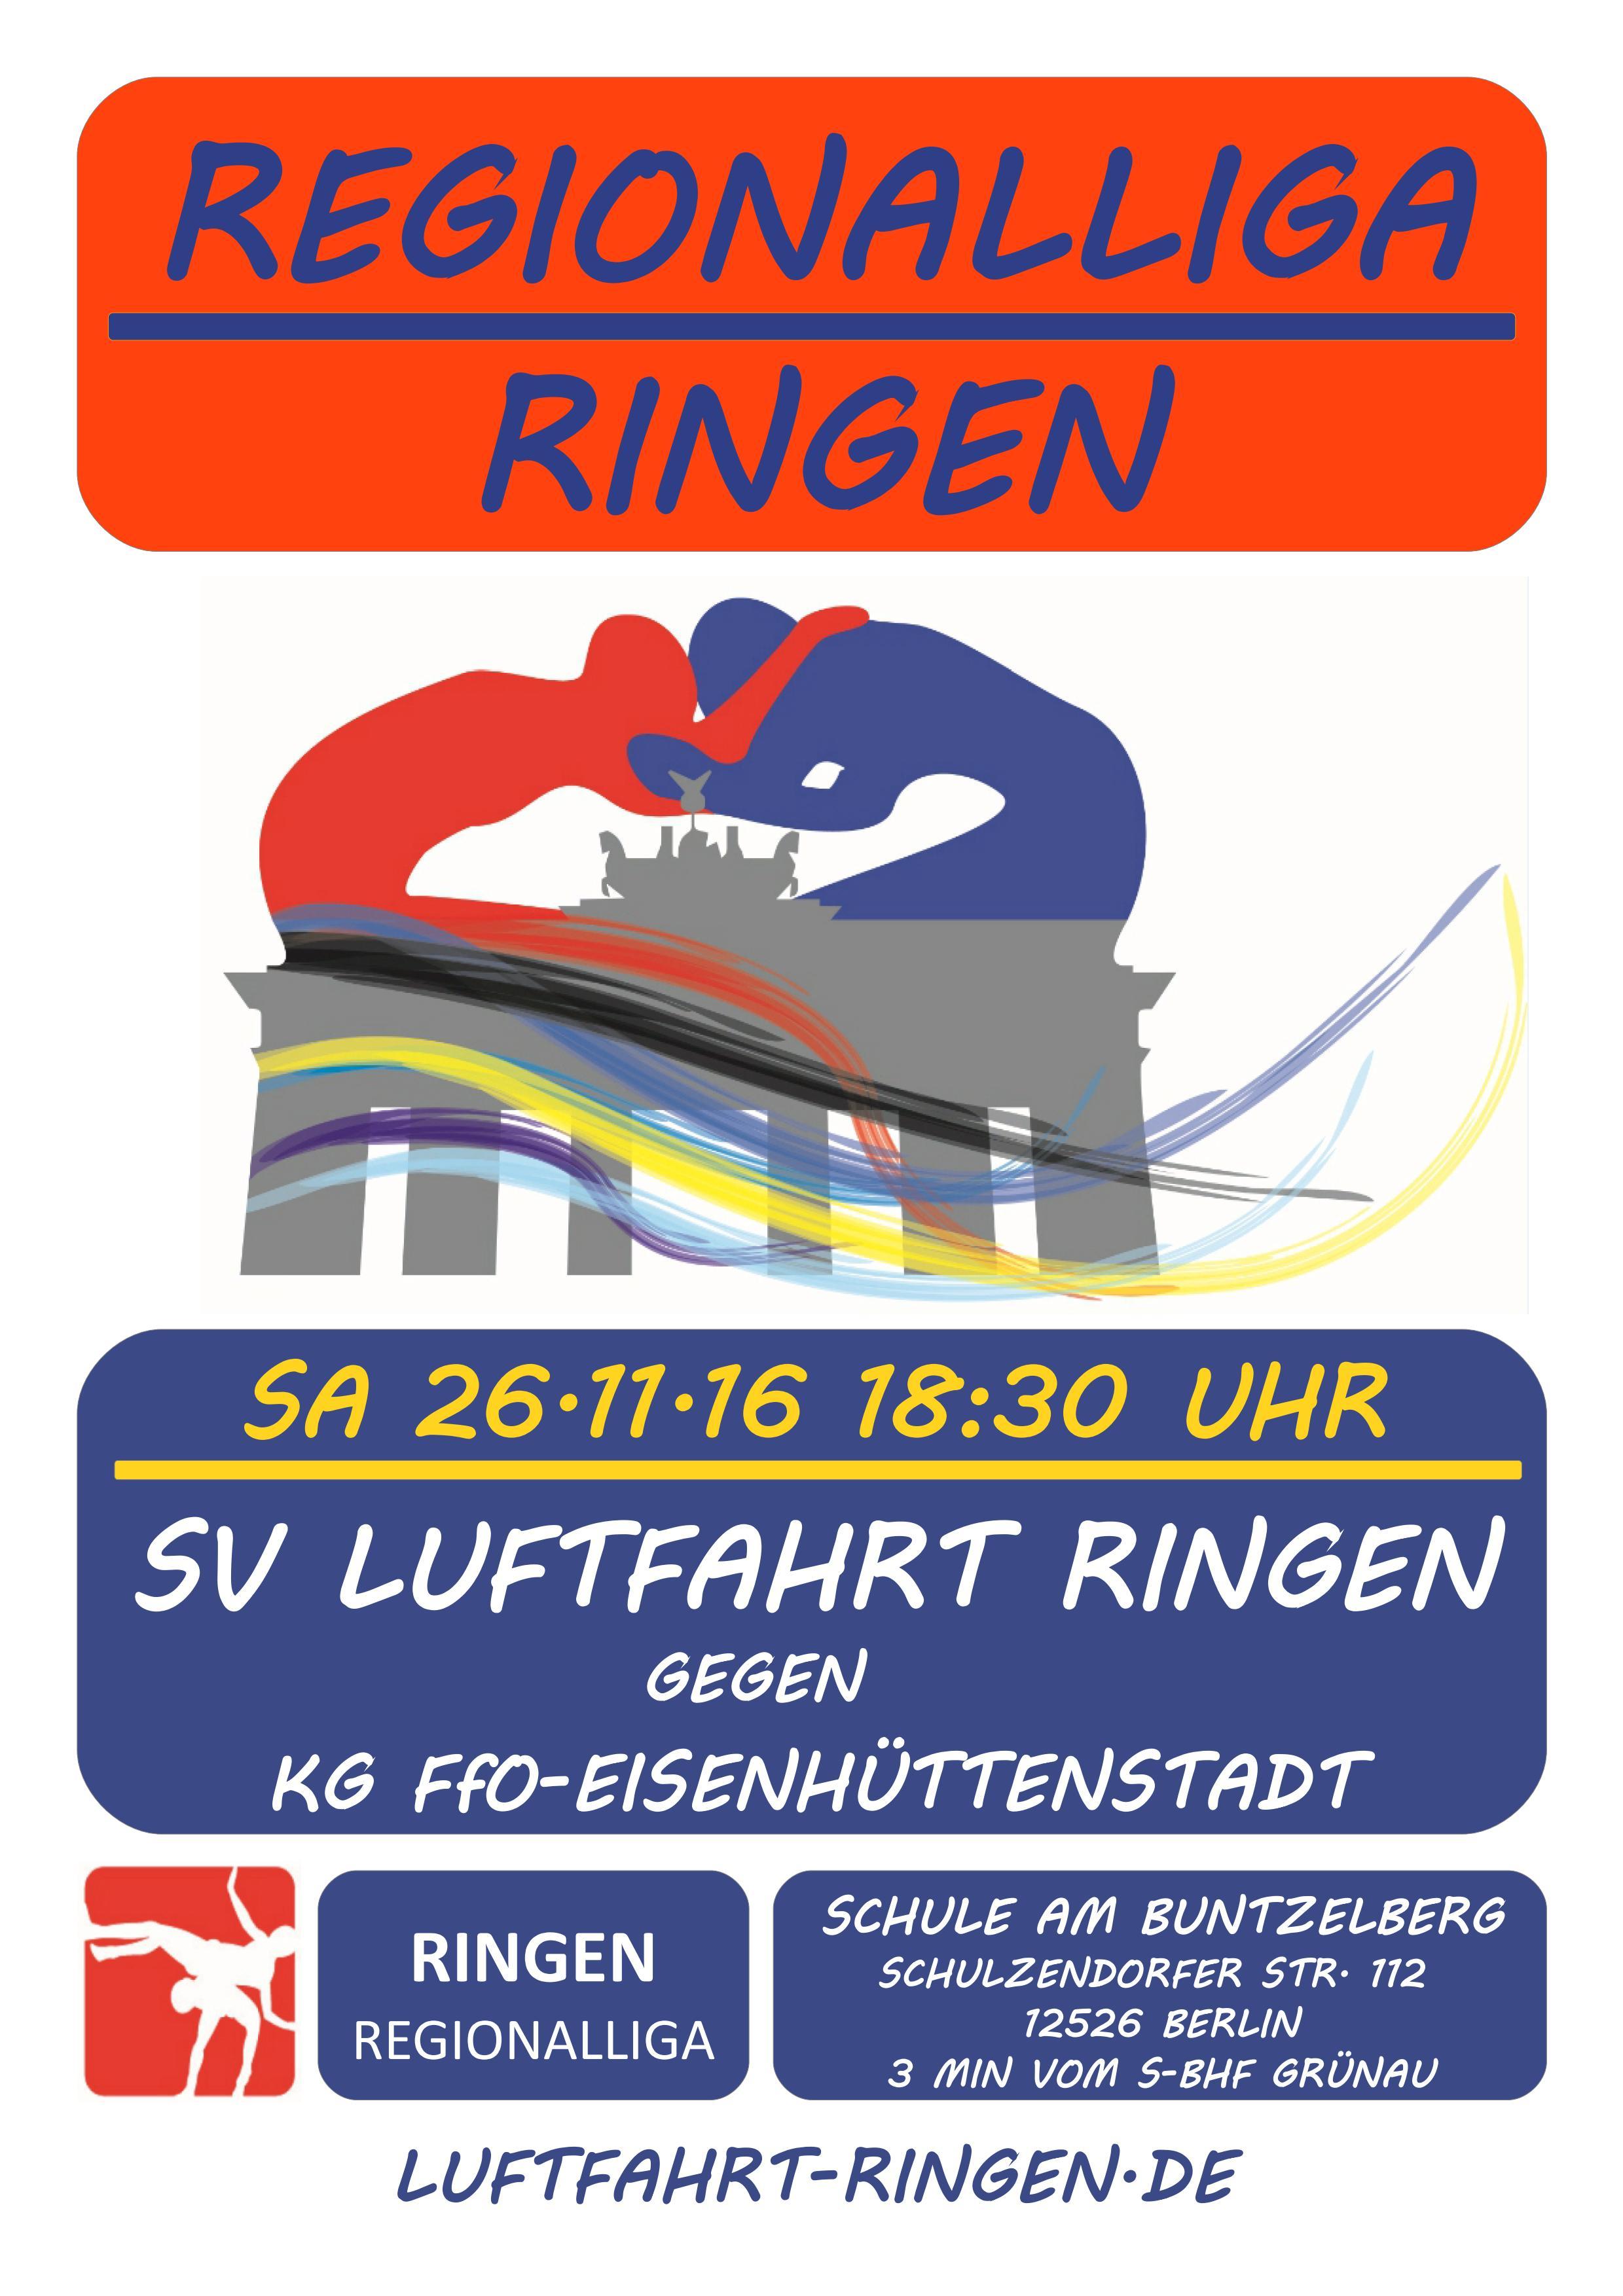 Regionalliga Heimkampf gg. KG Ff/O-Eisenhüttenstadt